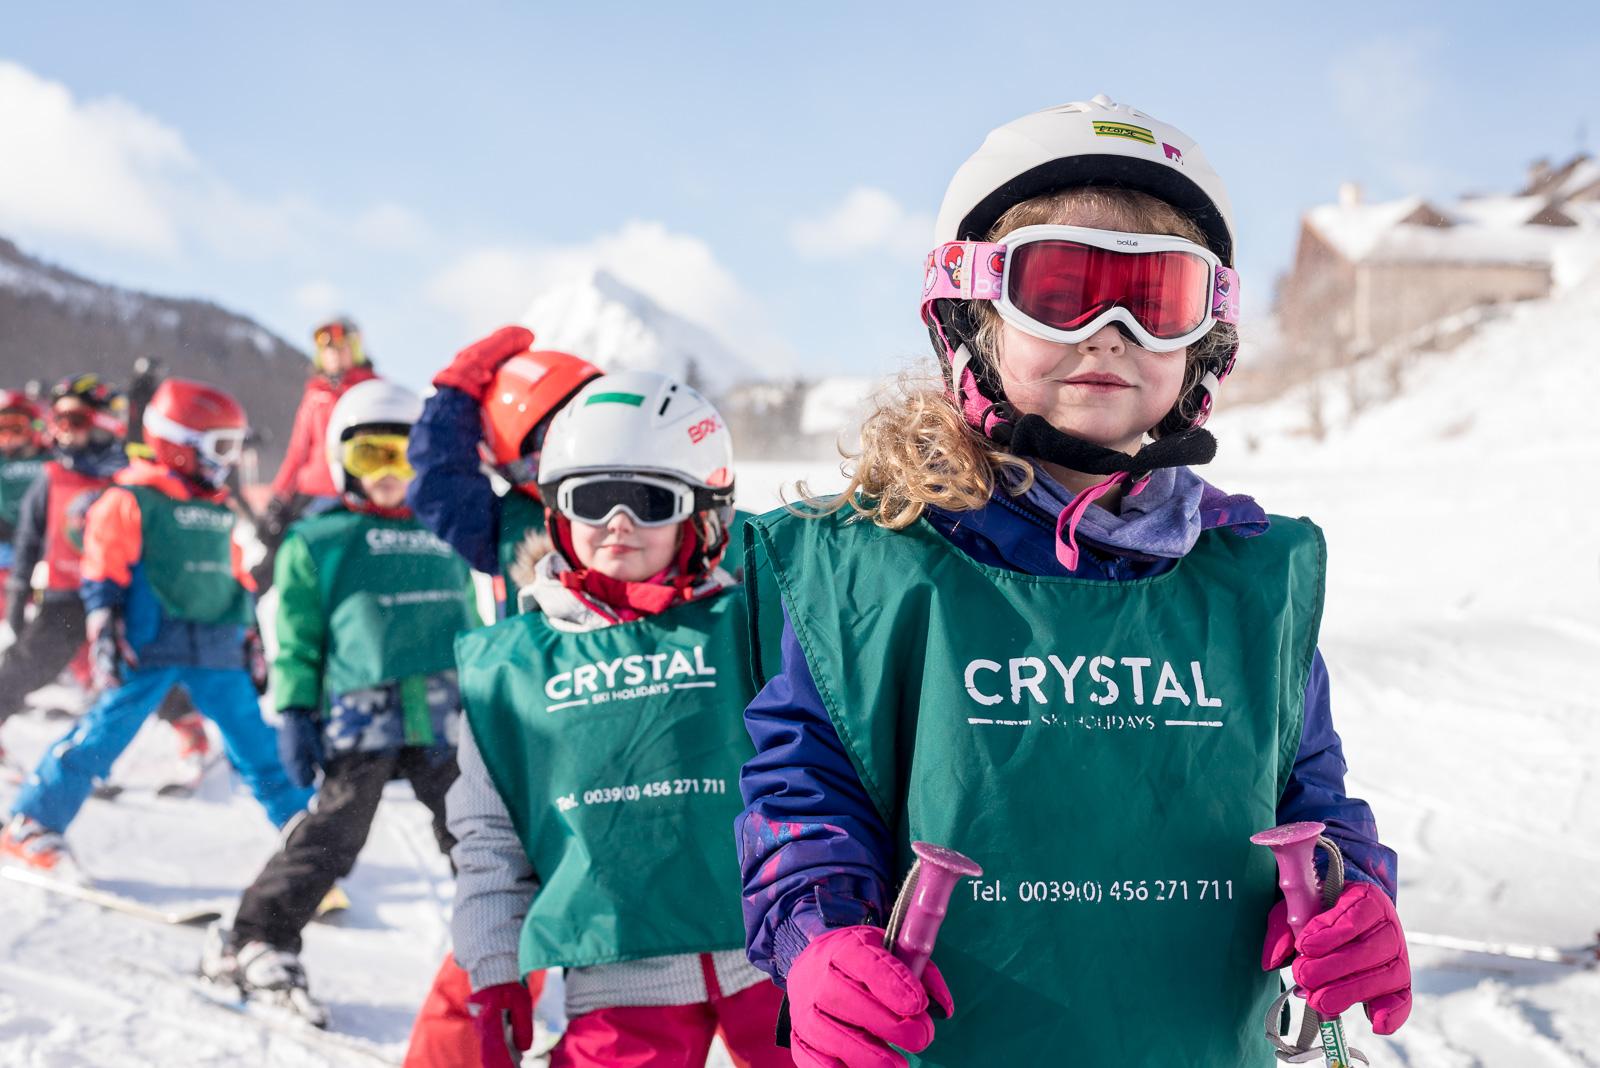 Crystal Ski, Italy